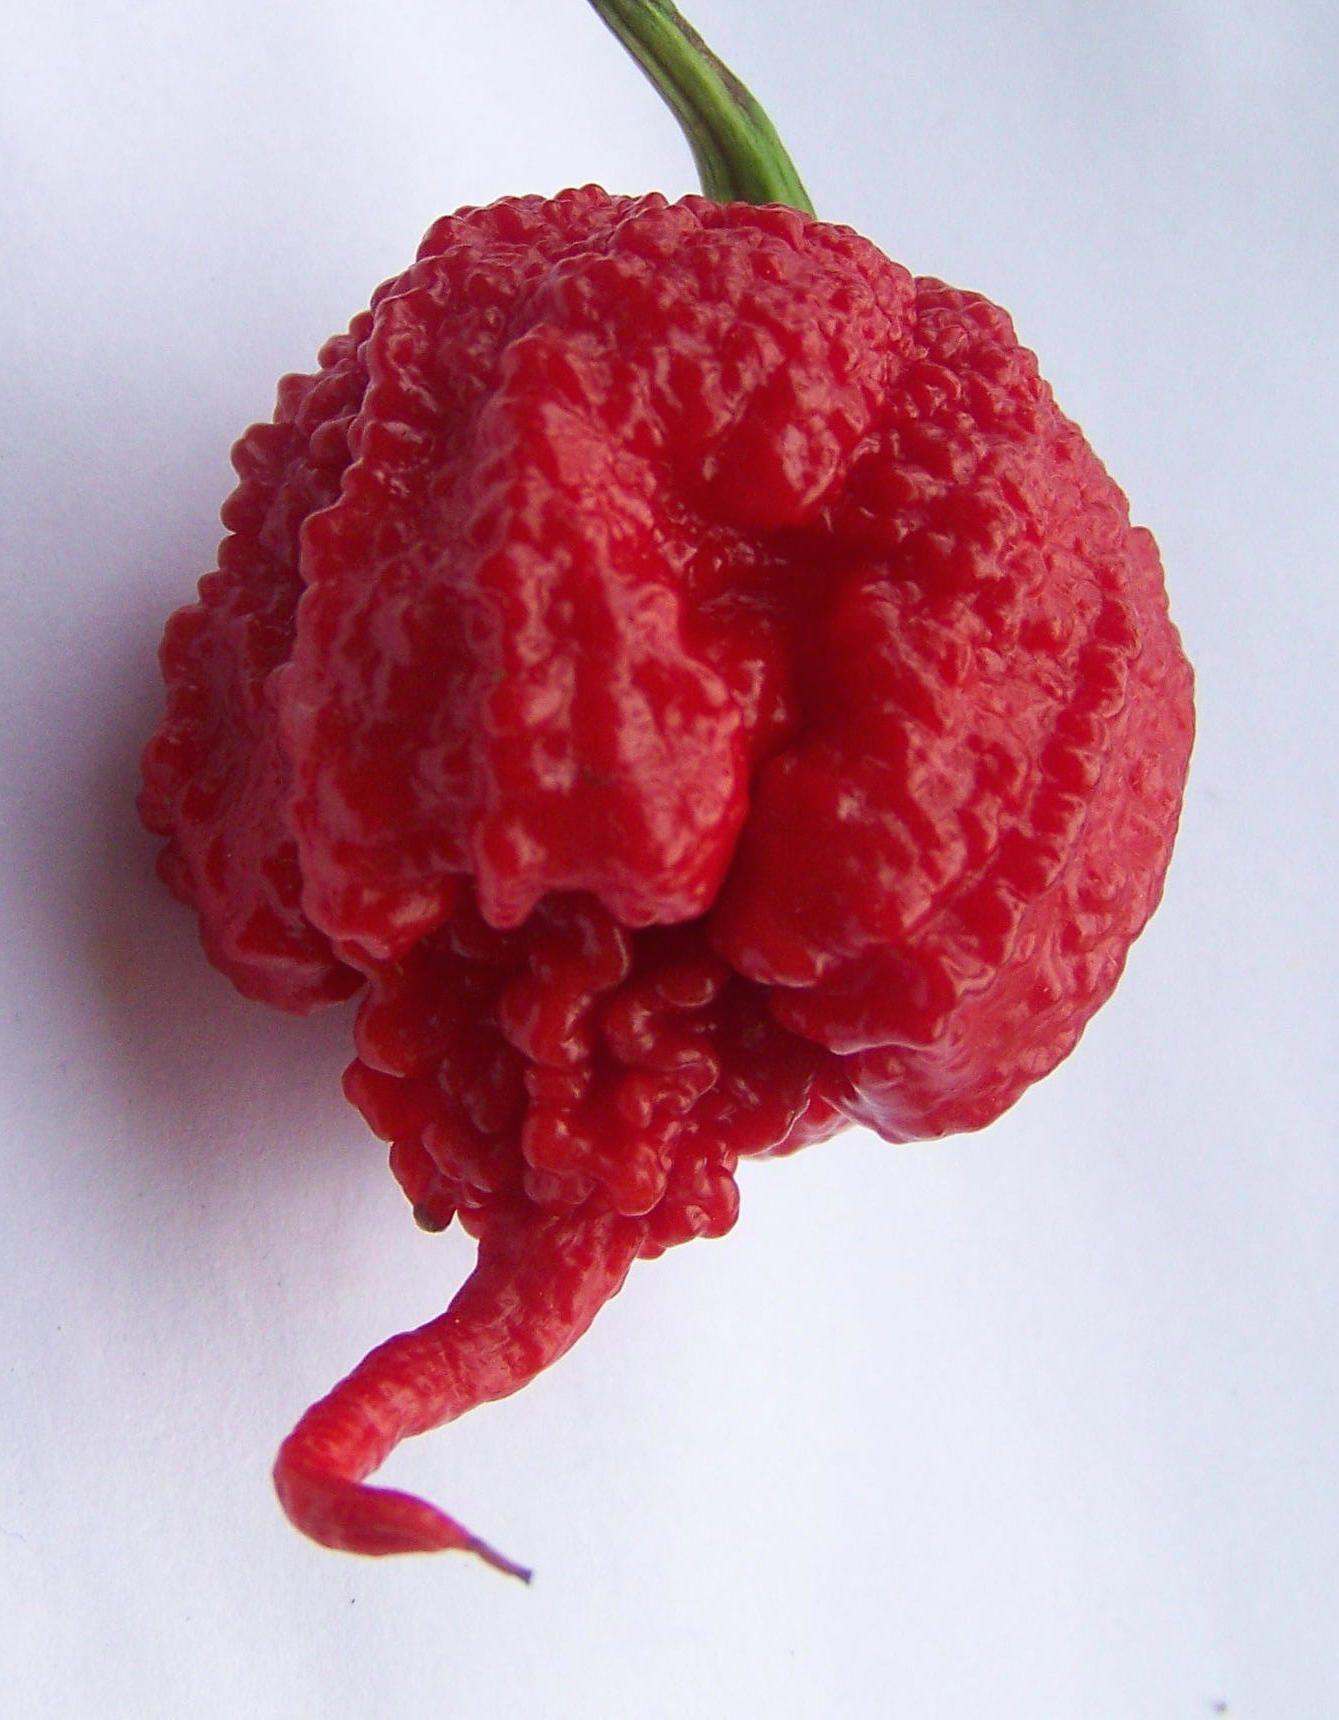 Carolina Reaper Chili Pepper. THE hottest pepper in the world, developed right…